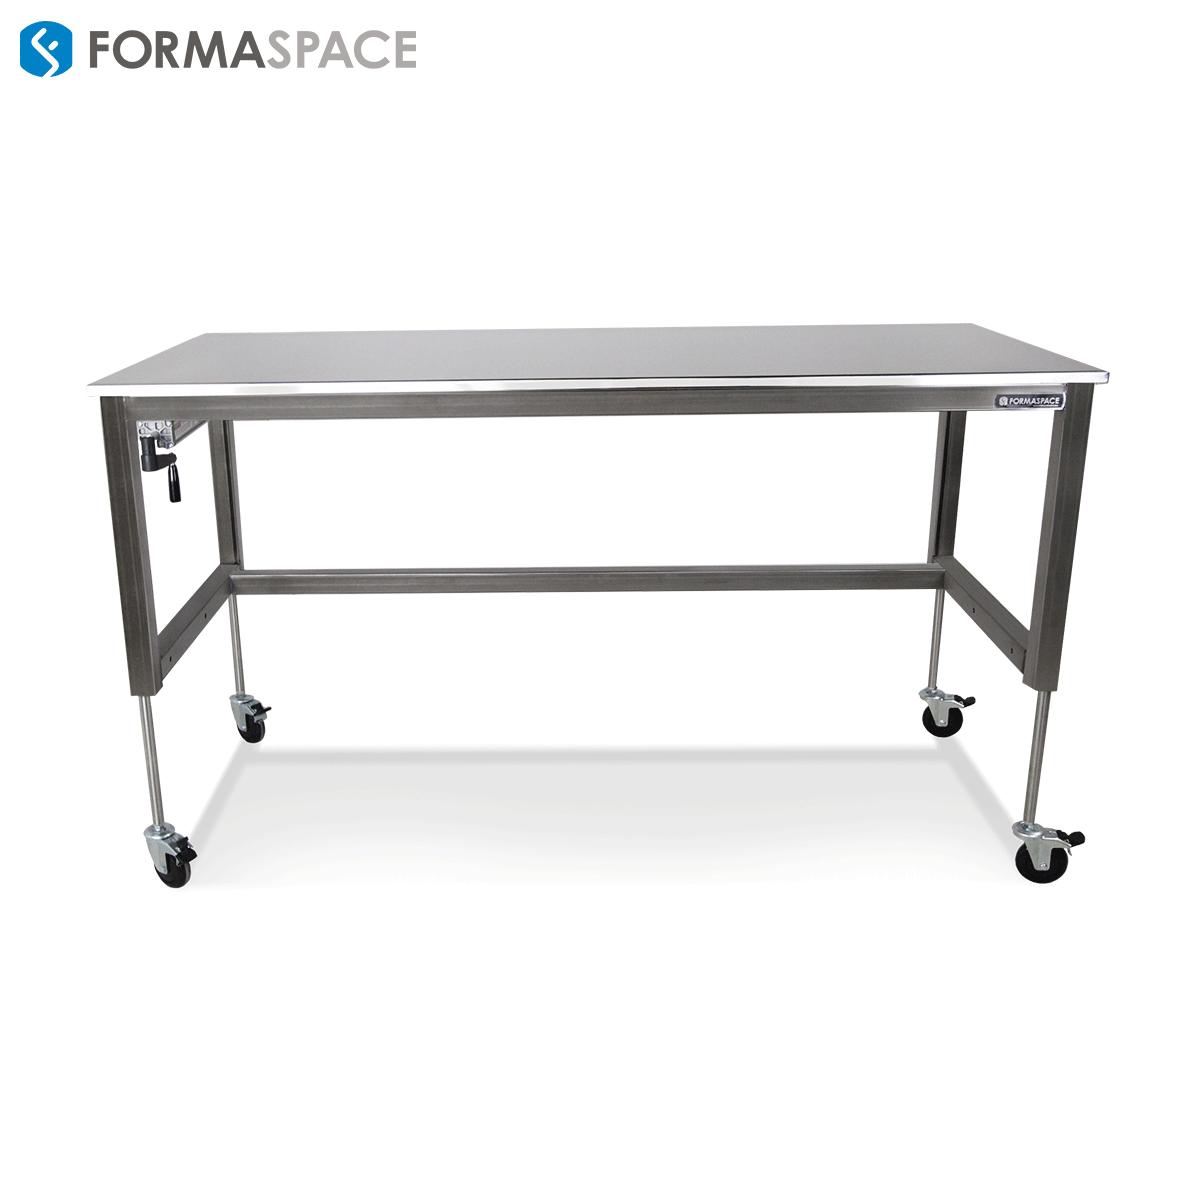 best laboratory bench basix formaspace